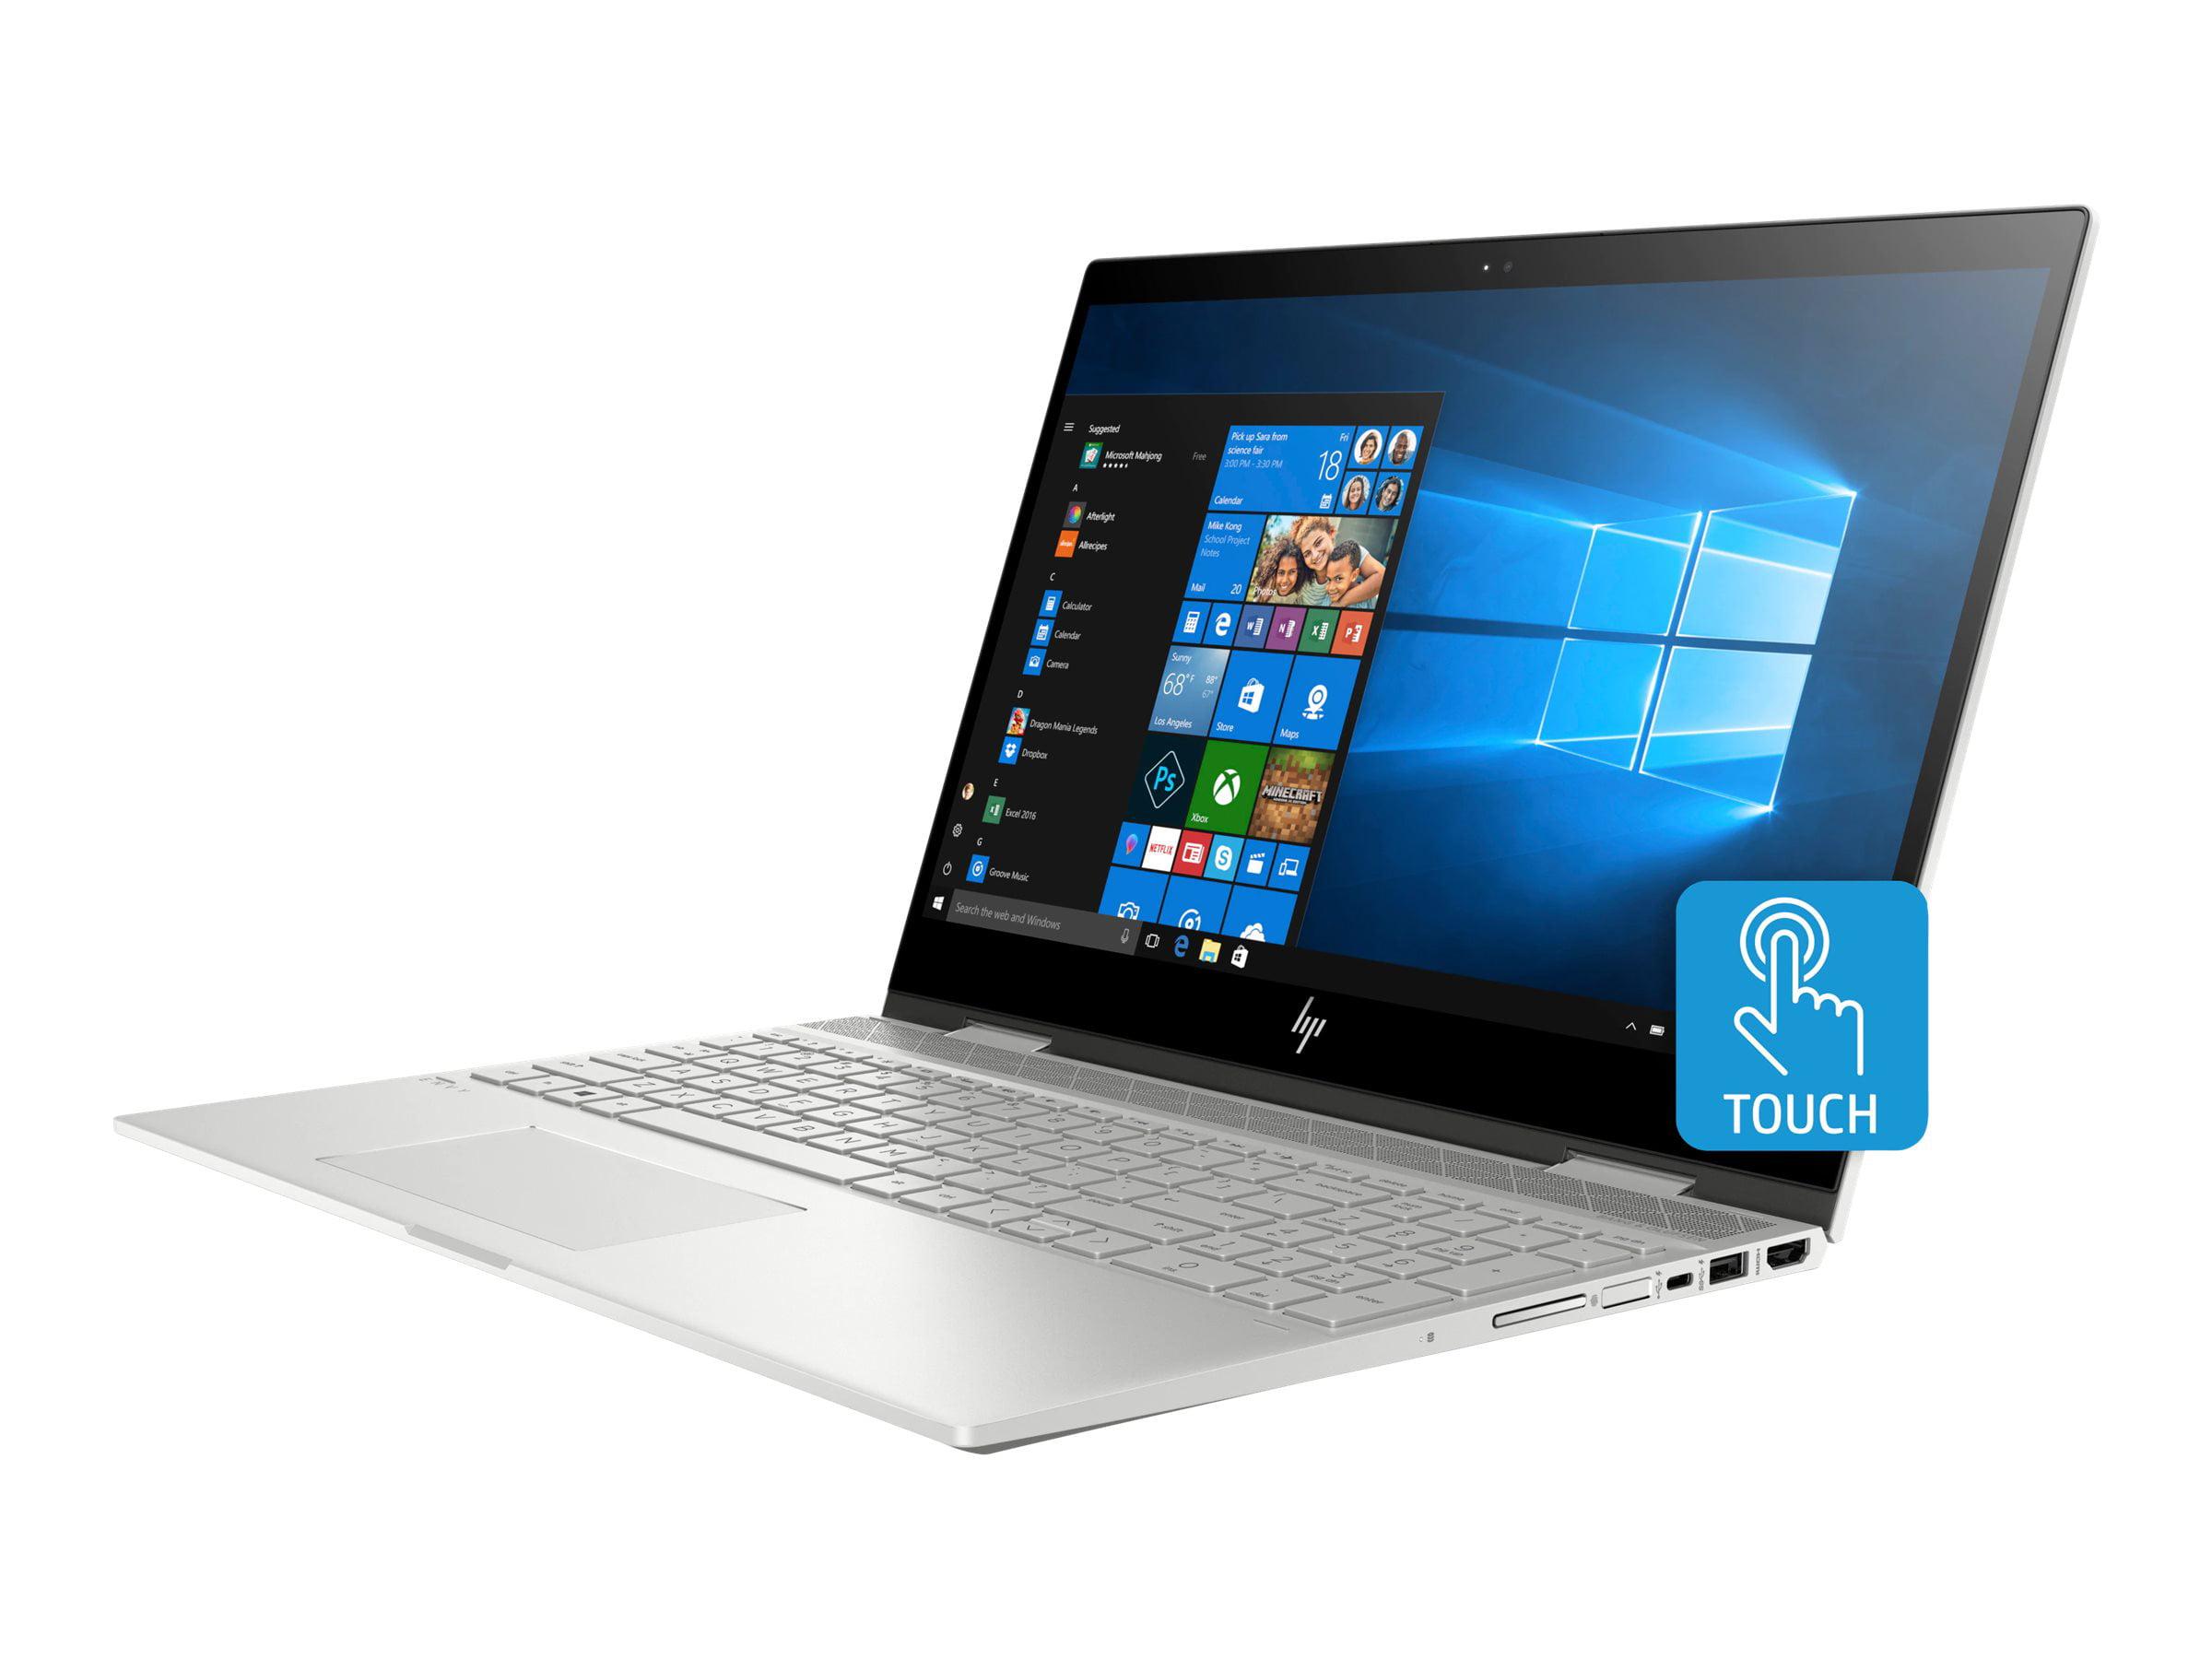 Hp Envy X360 15m Cn0011dx Flip Design Core I5 8250u 1 6 Ghz Windows 10 Home 8 Gb Ram 256 Gb Ssd Nvme 15 6 Ips Touchscreen 1920